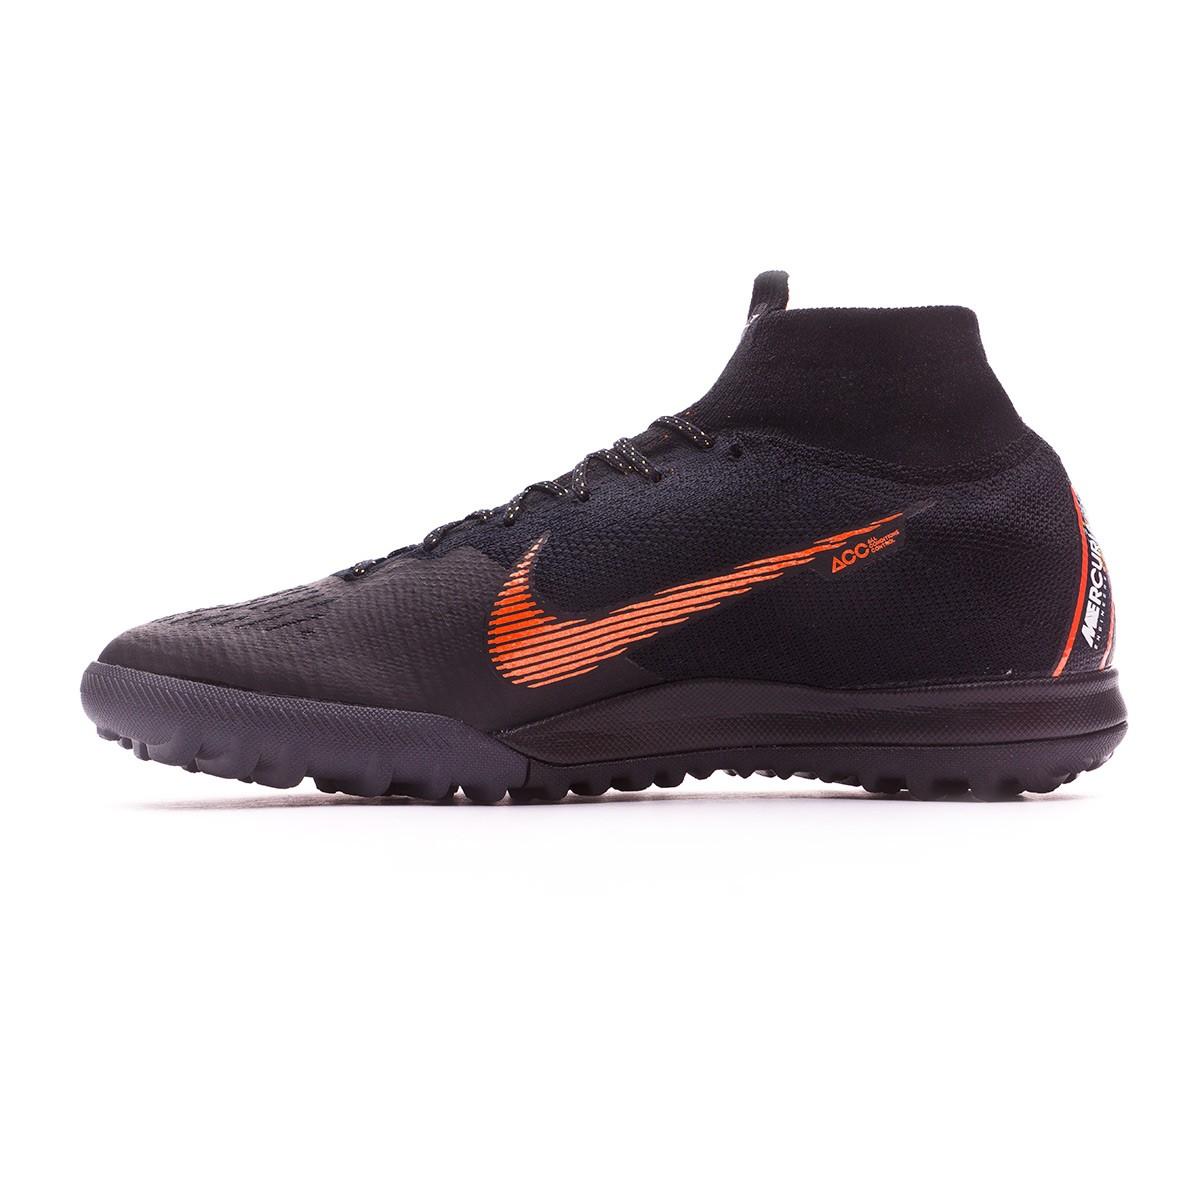 Retencion Prescripción Roble  Football Boot Nike Mercurial SuperflyX VI Elite Turf Black-Total  orange-White - Football store Fútbol Emotion